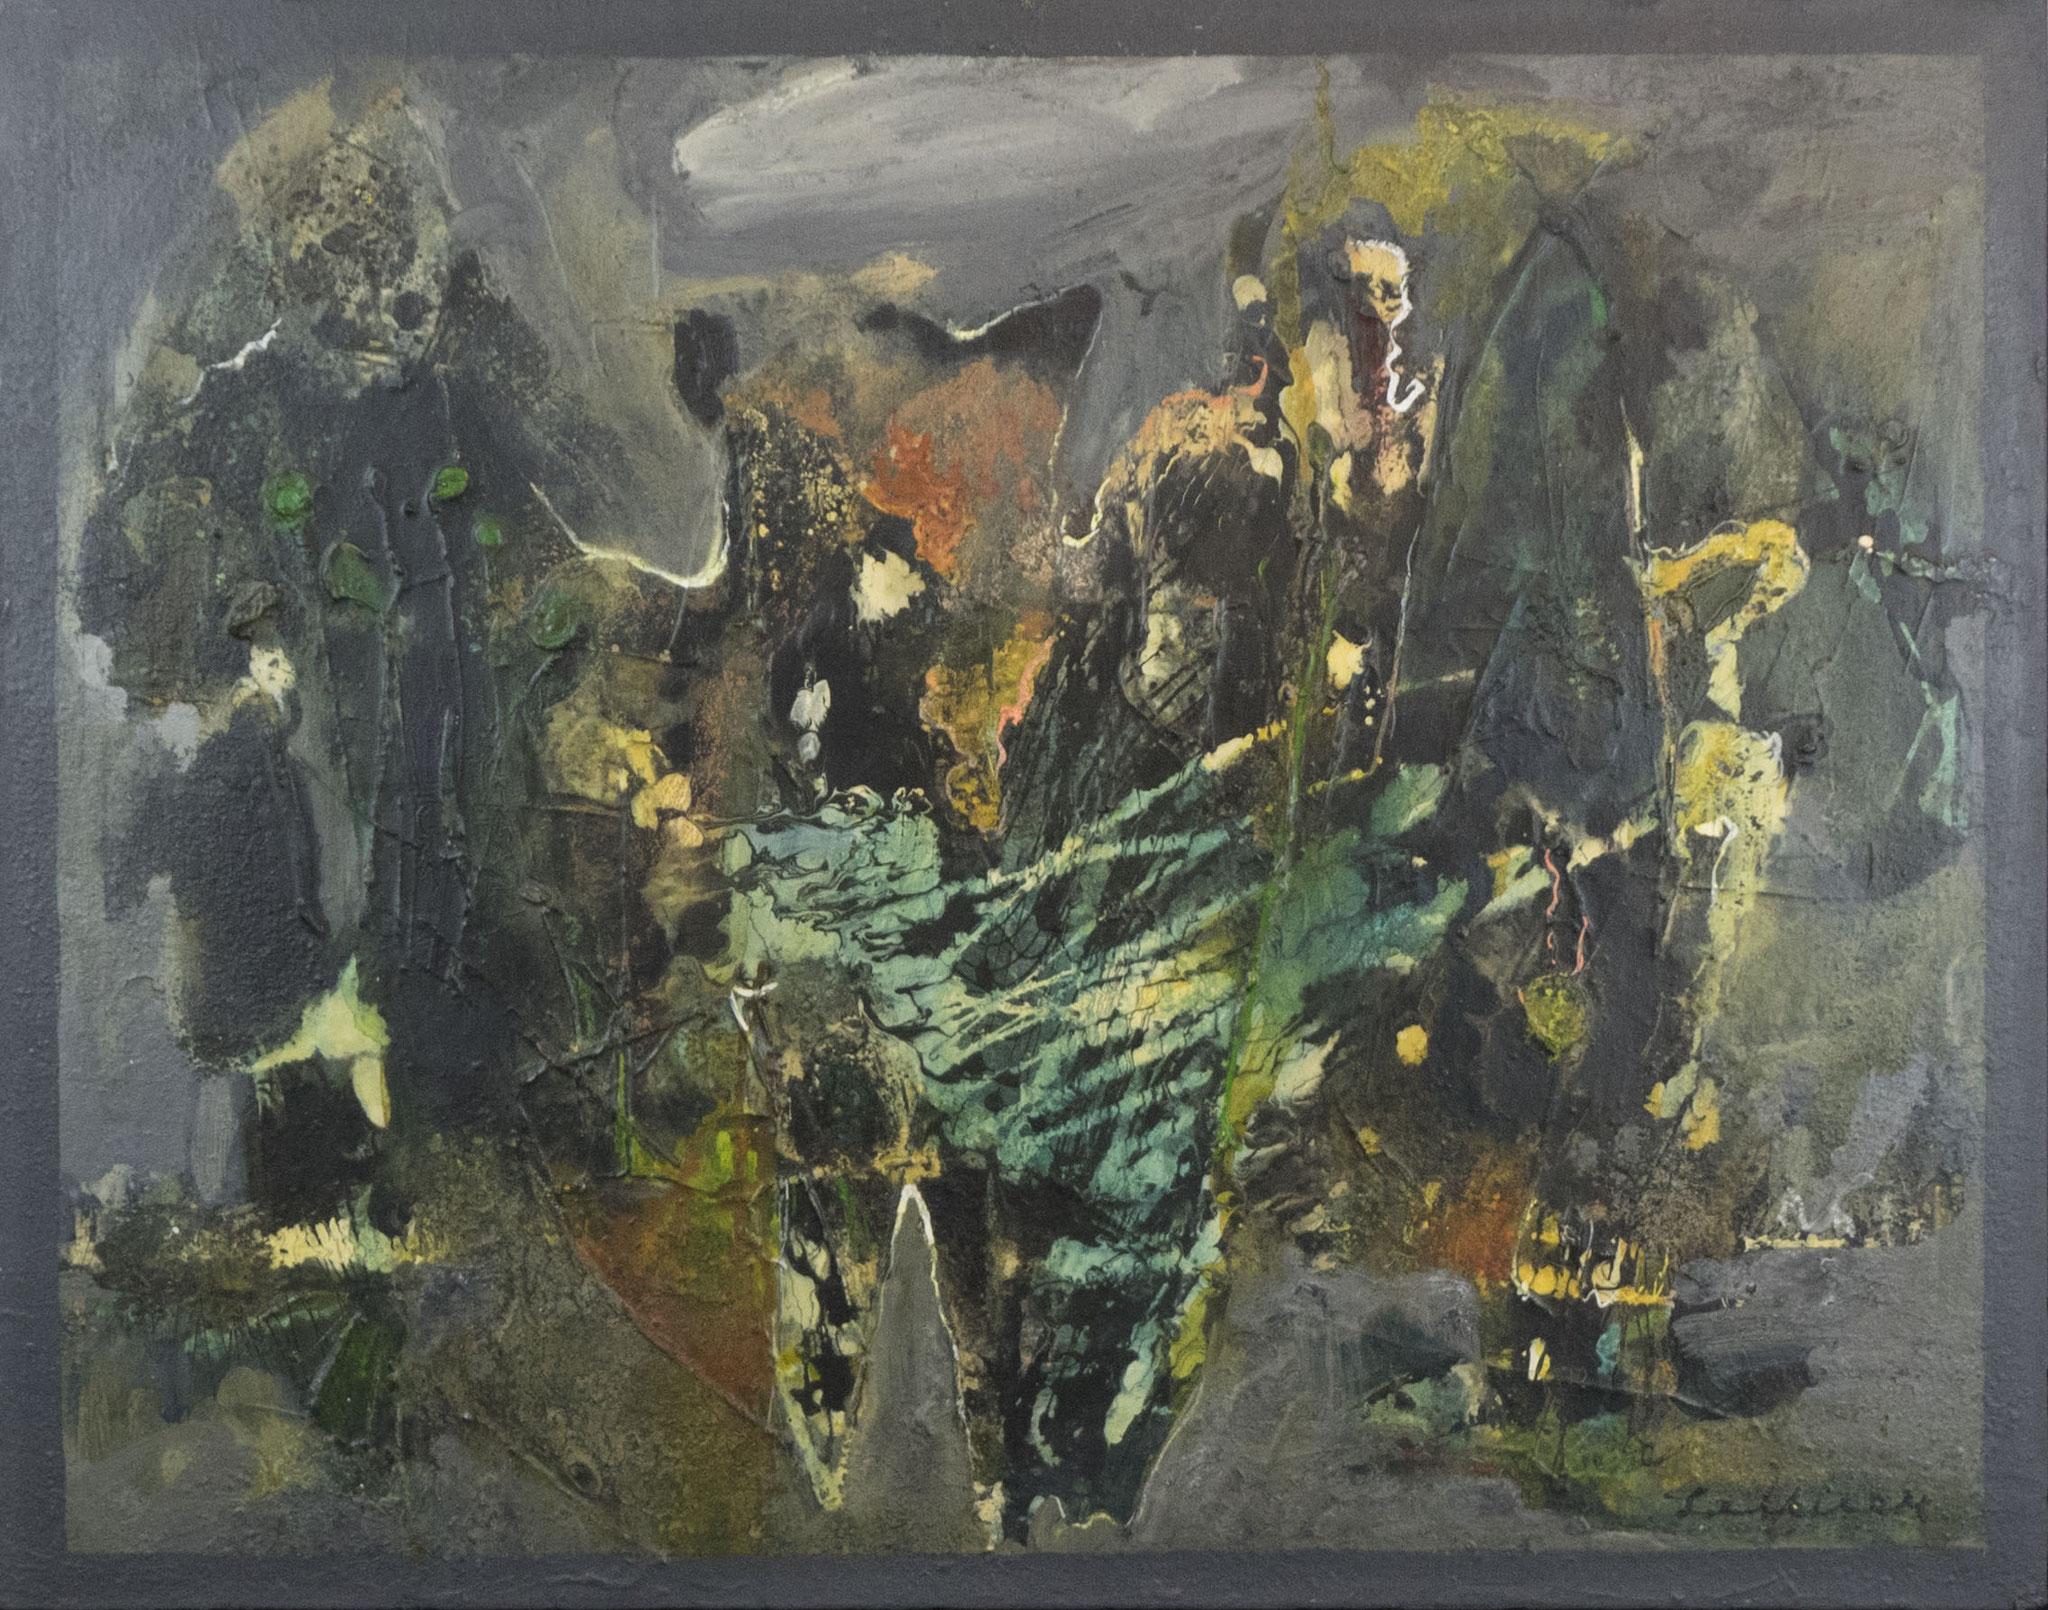 """4 Träume Traum 4"" 1963 - Öl auf Leinwand - 96x75,5 cm"